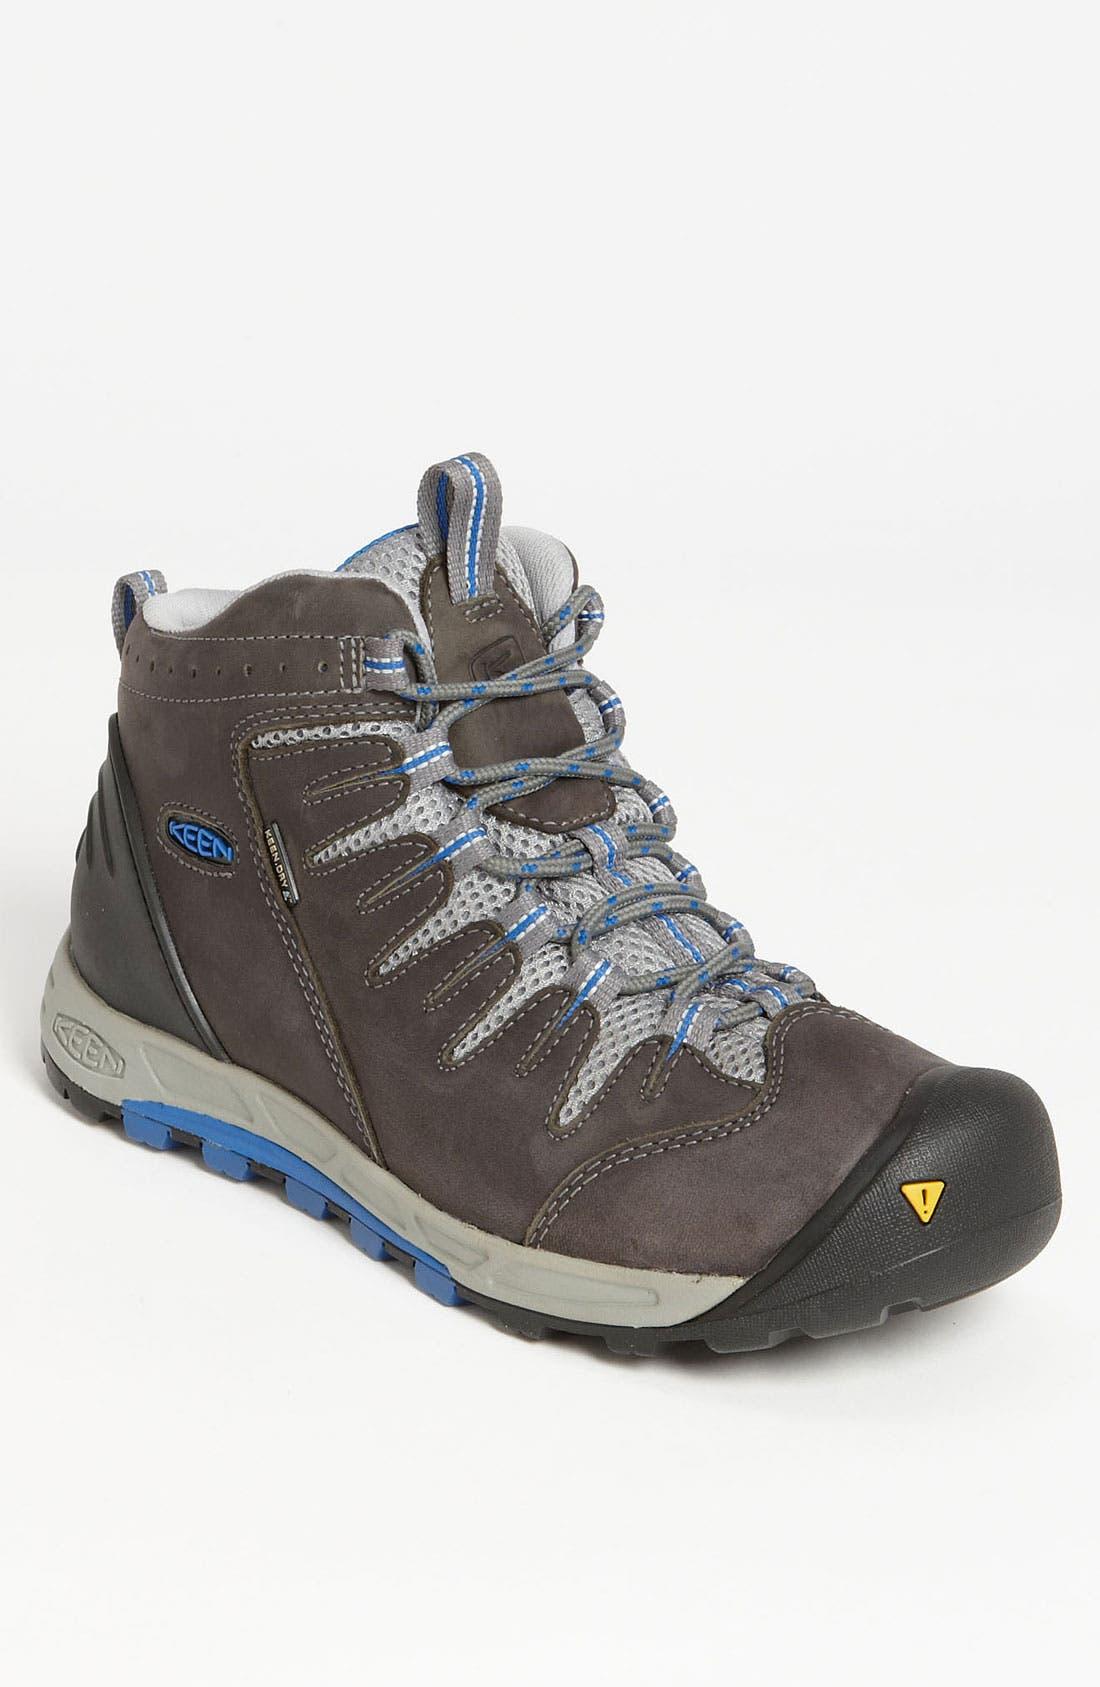 Main Image - Keen 'Bryce' Hiking Boot (Men)